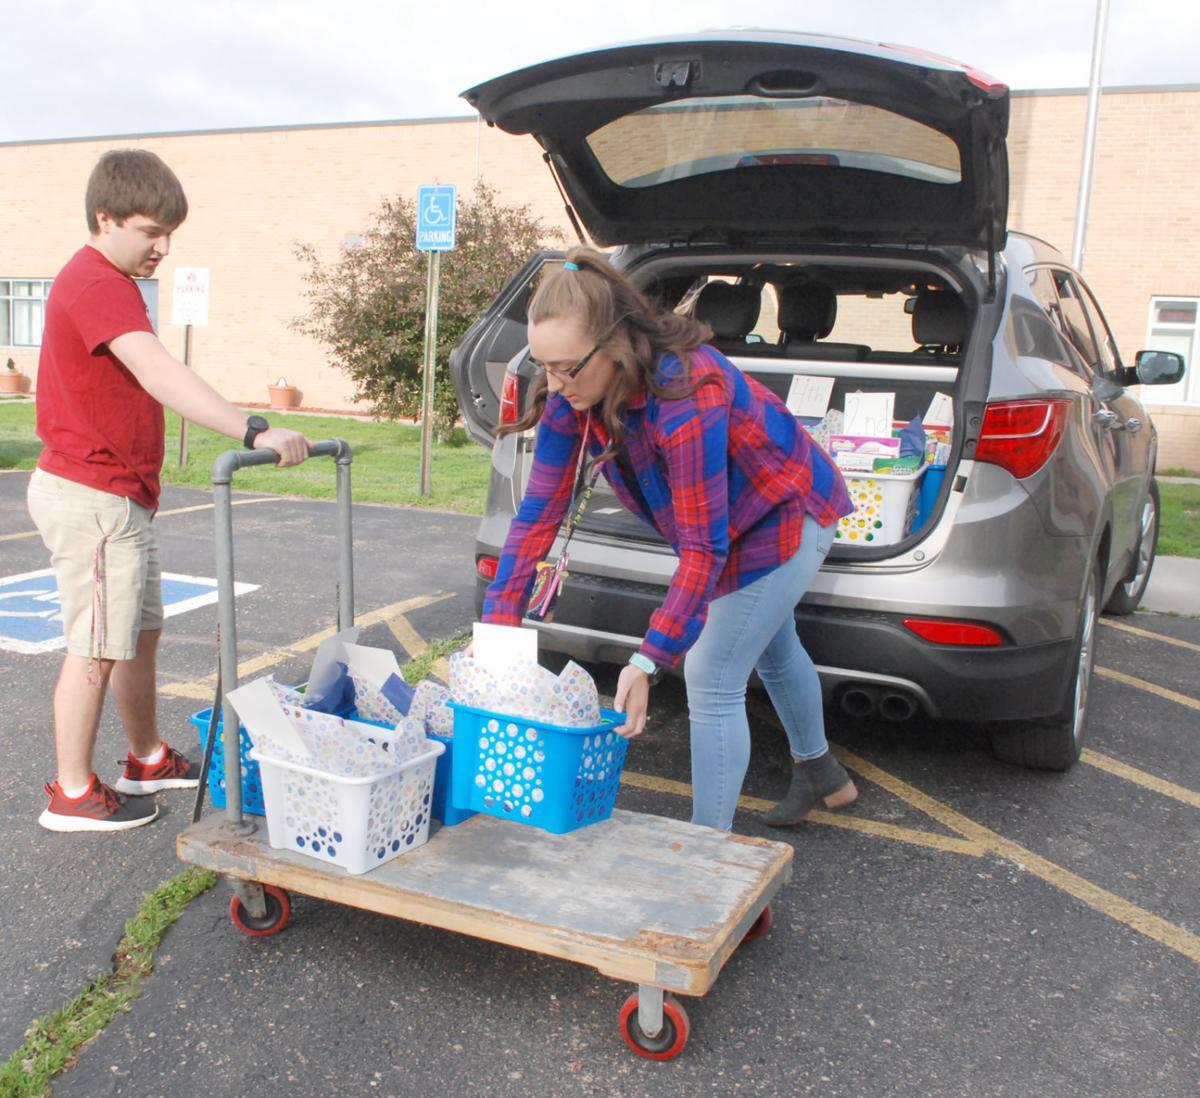 Brooke and Nathan unloading supplies